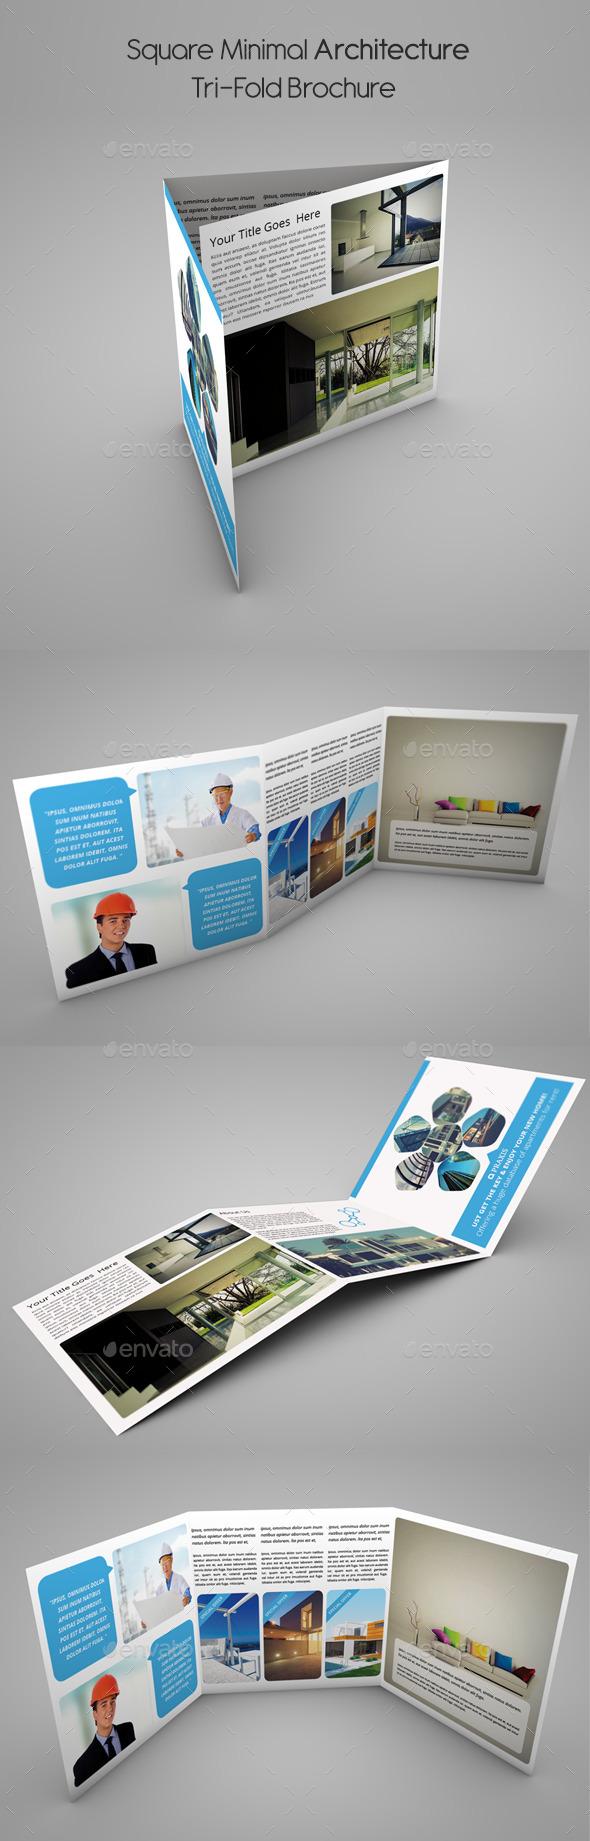 Square Minimal Architecture Tri-Fold Brochure  - Brochures Print Templates